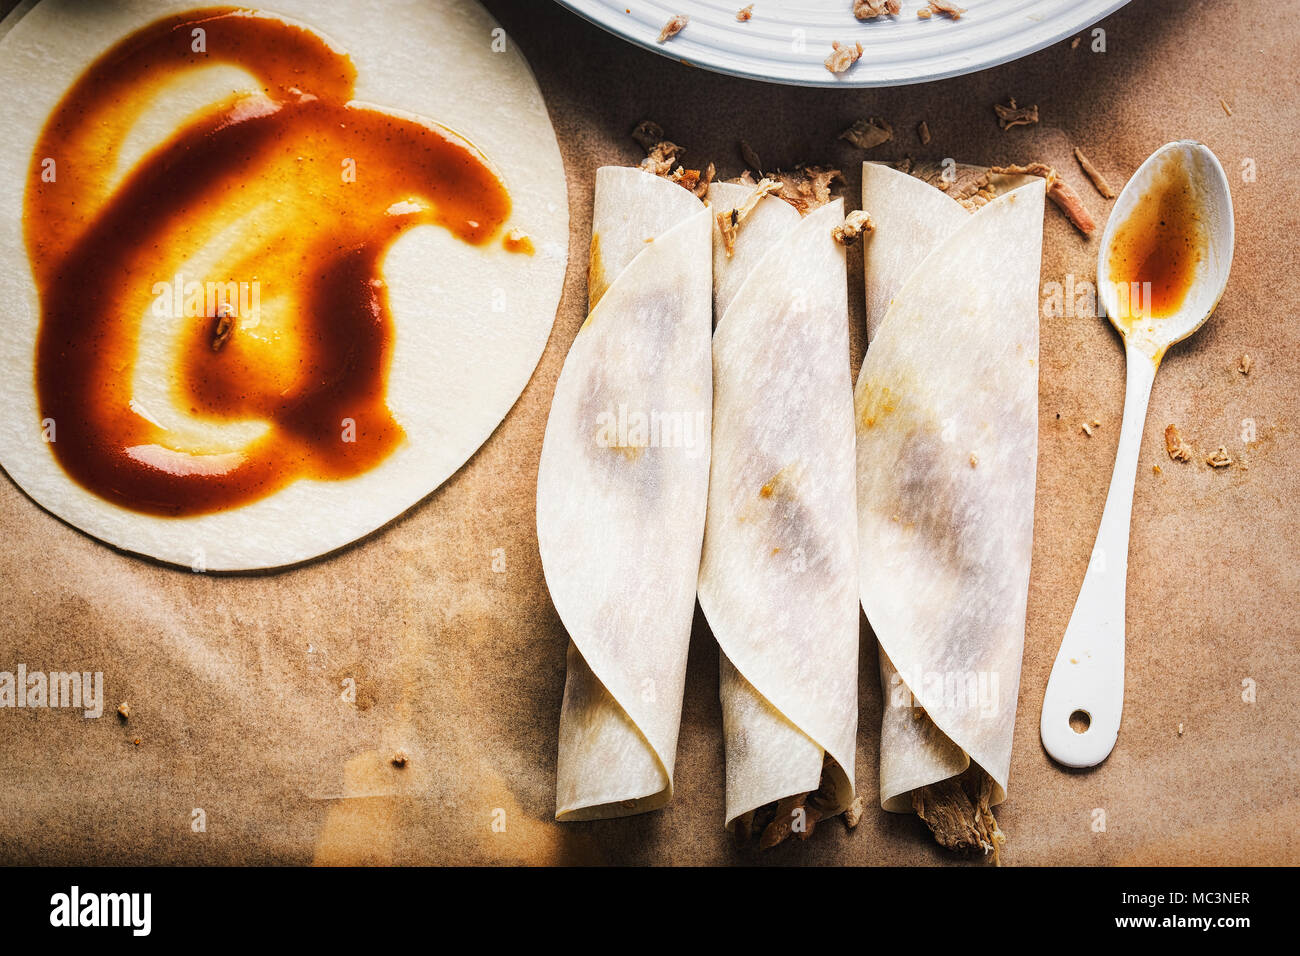 Beijing style duck pancakes with hoisin sauce - Stock Image